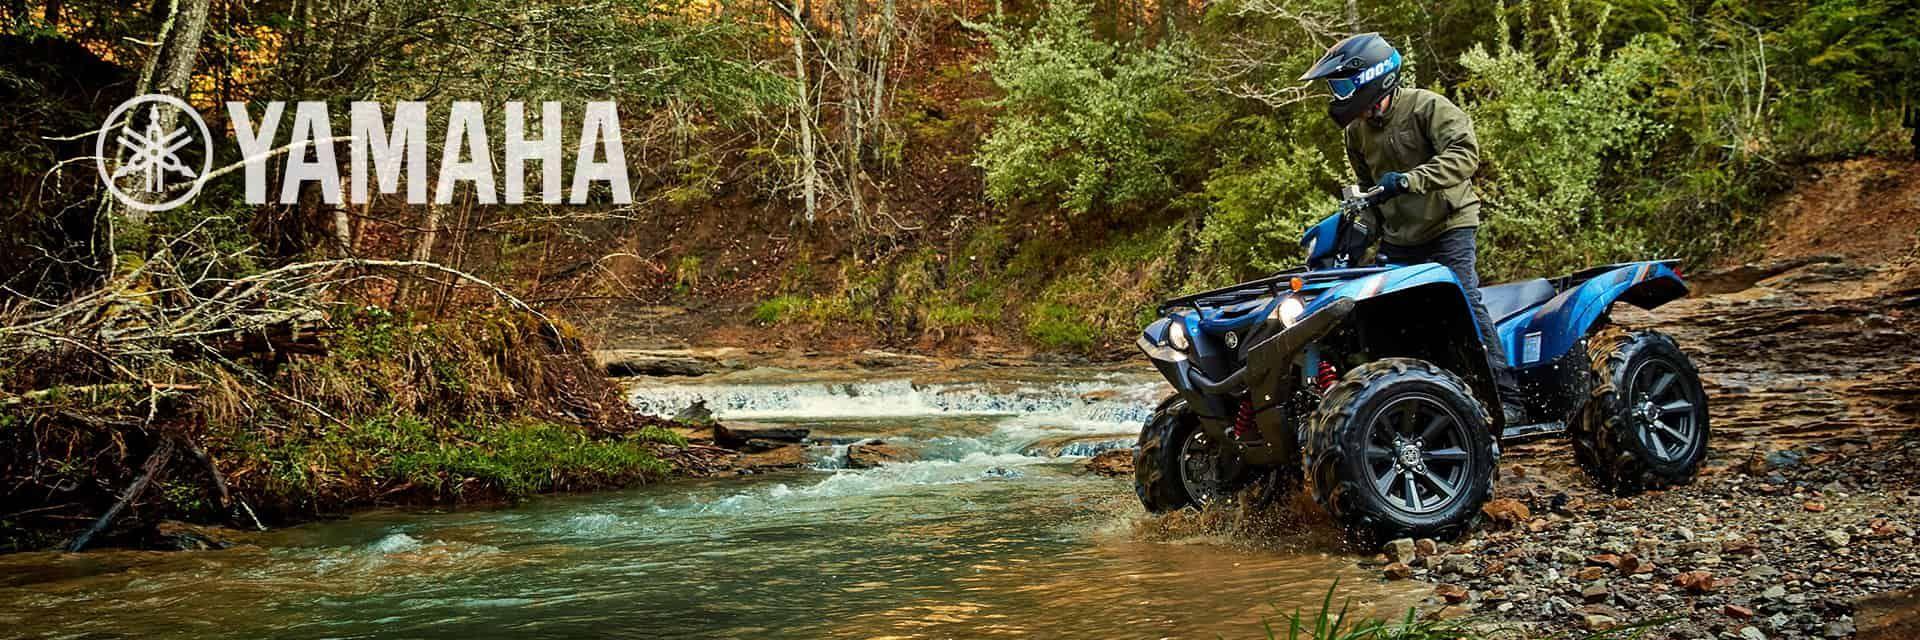 Yamaha is available at Sharp's Motorsports | Amarillo, TX